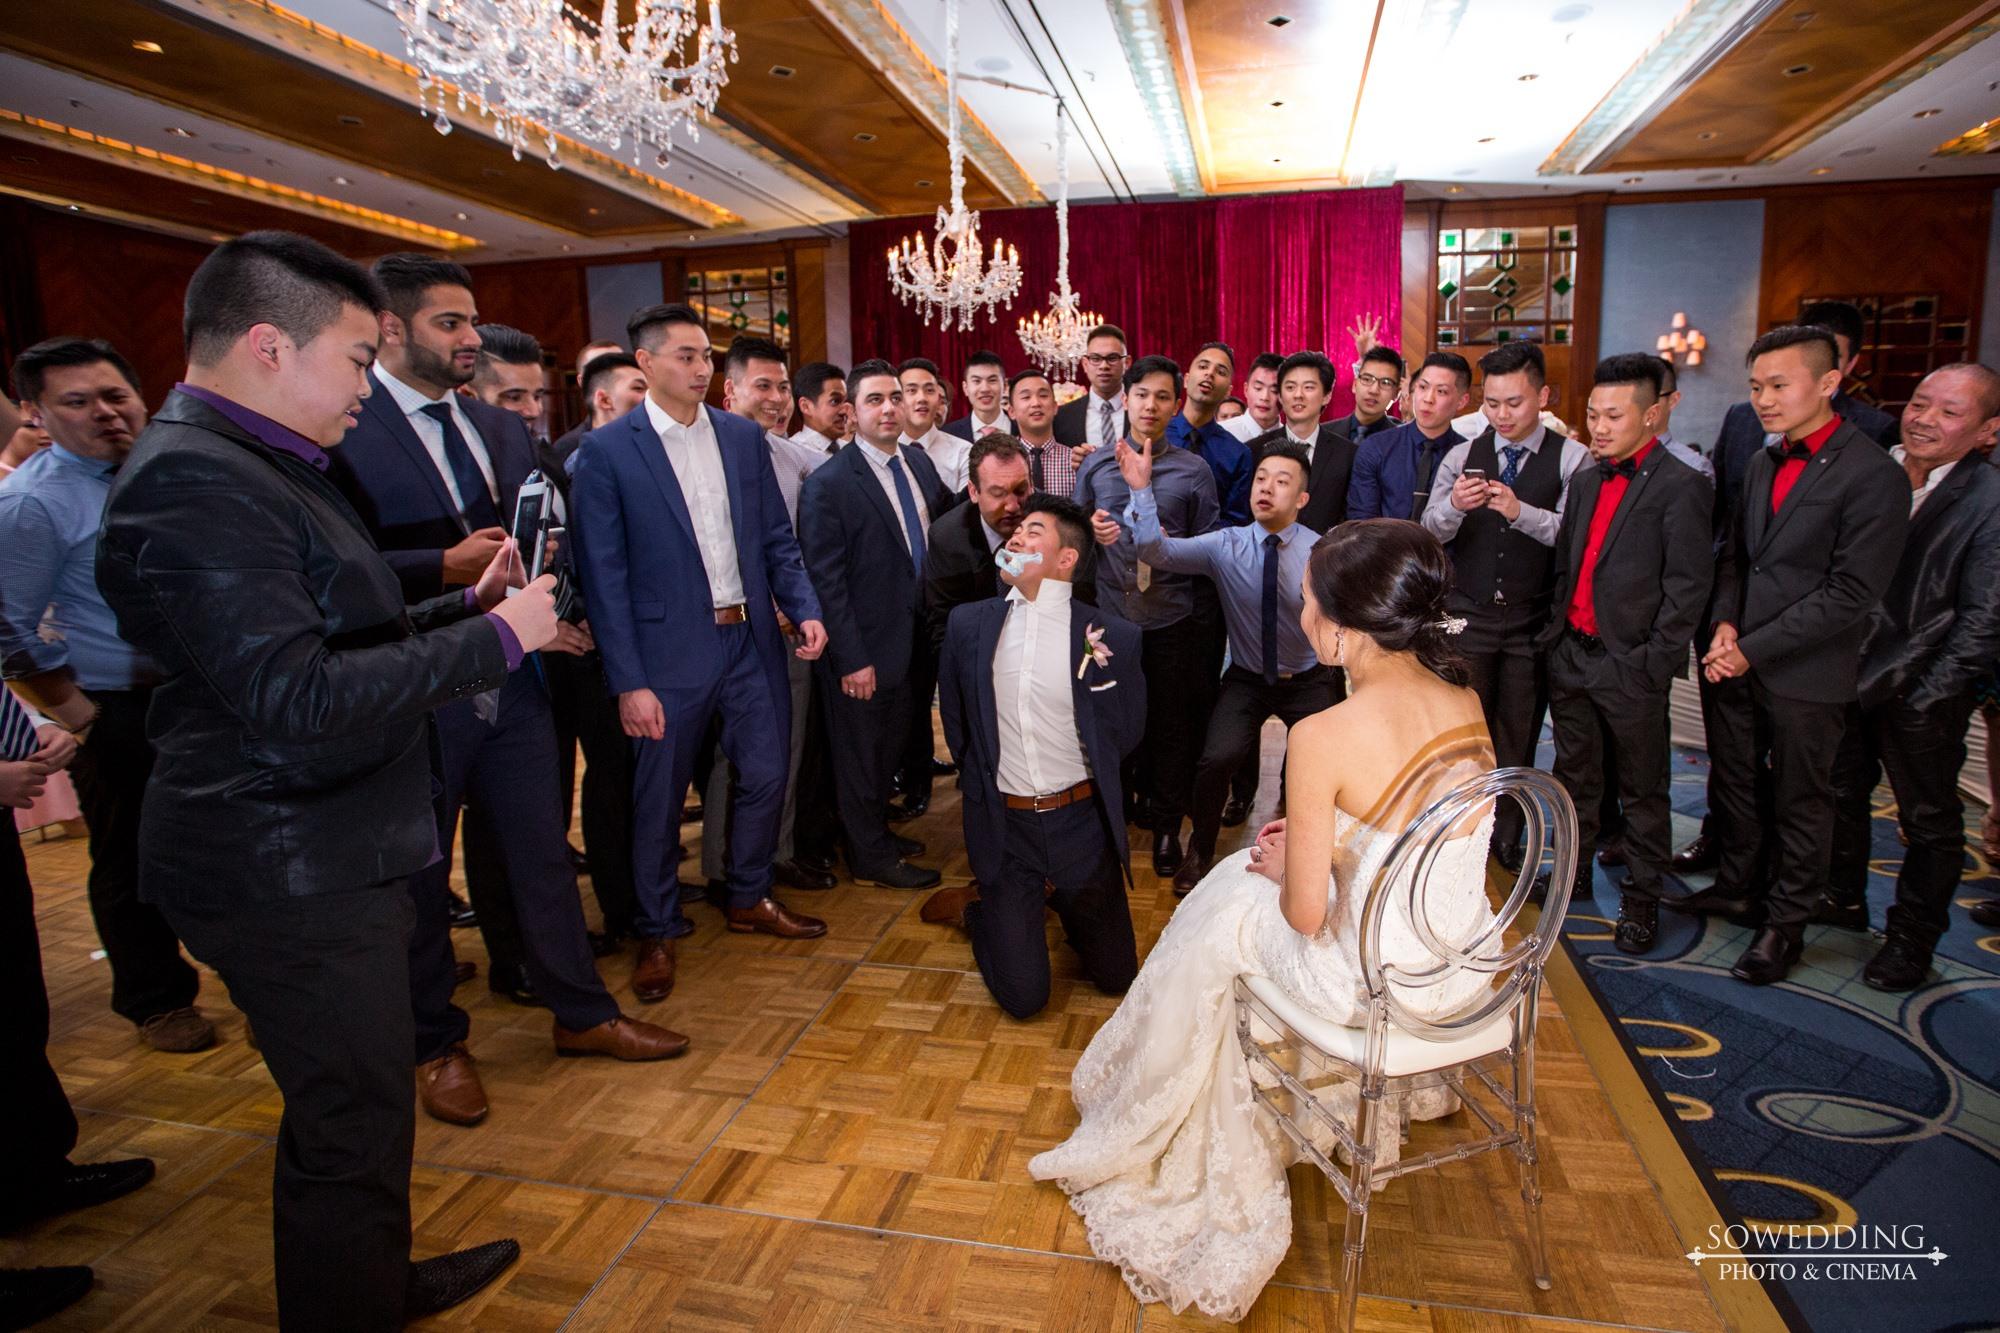 2016Mar26-Priscilla&Michael-wedding-HL-SD-0301